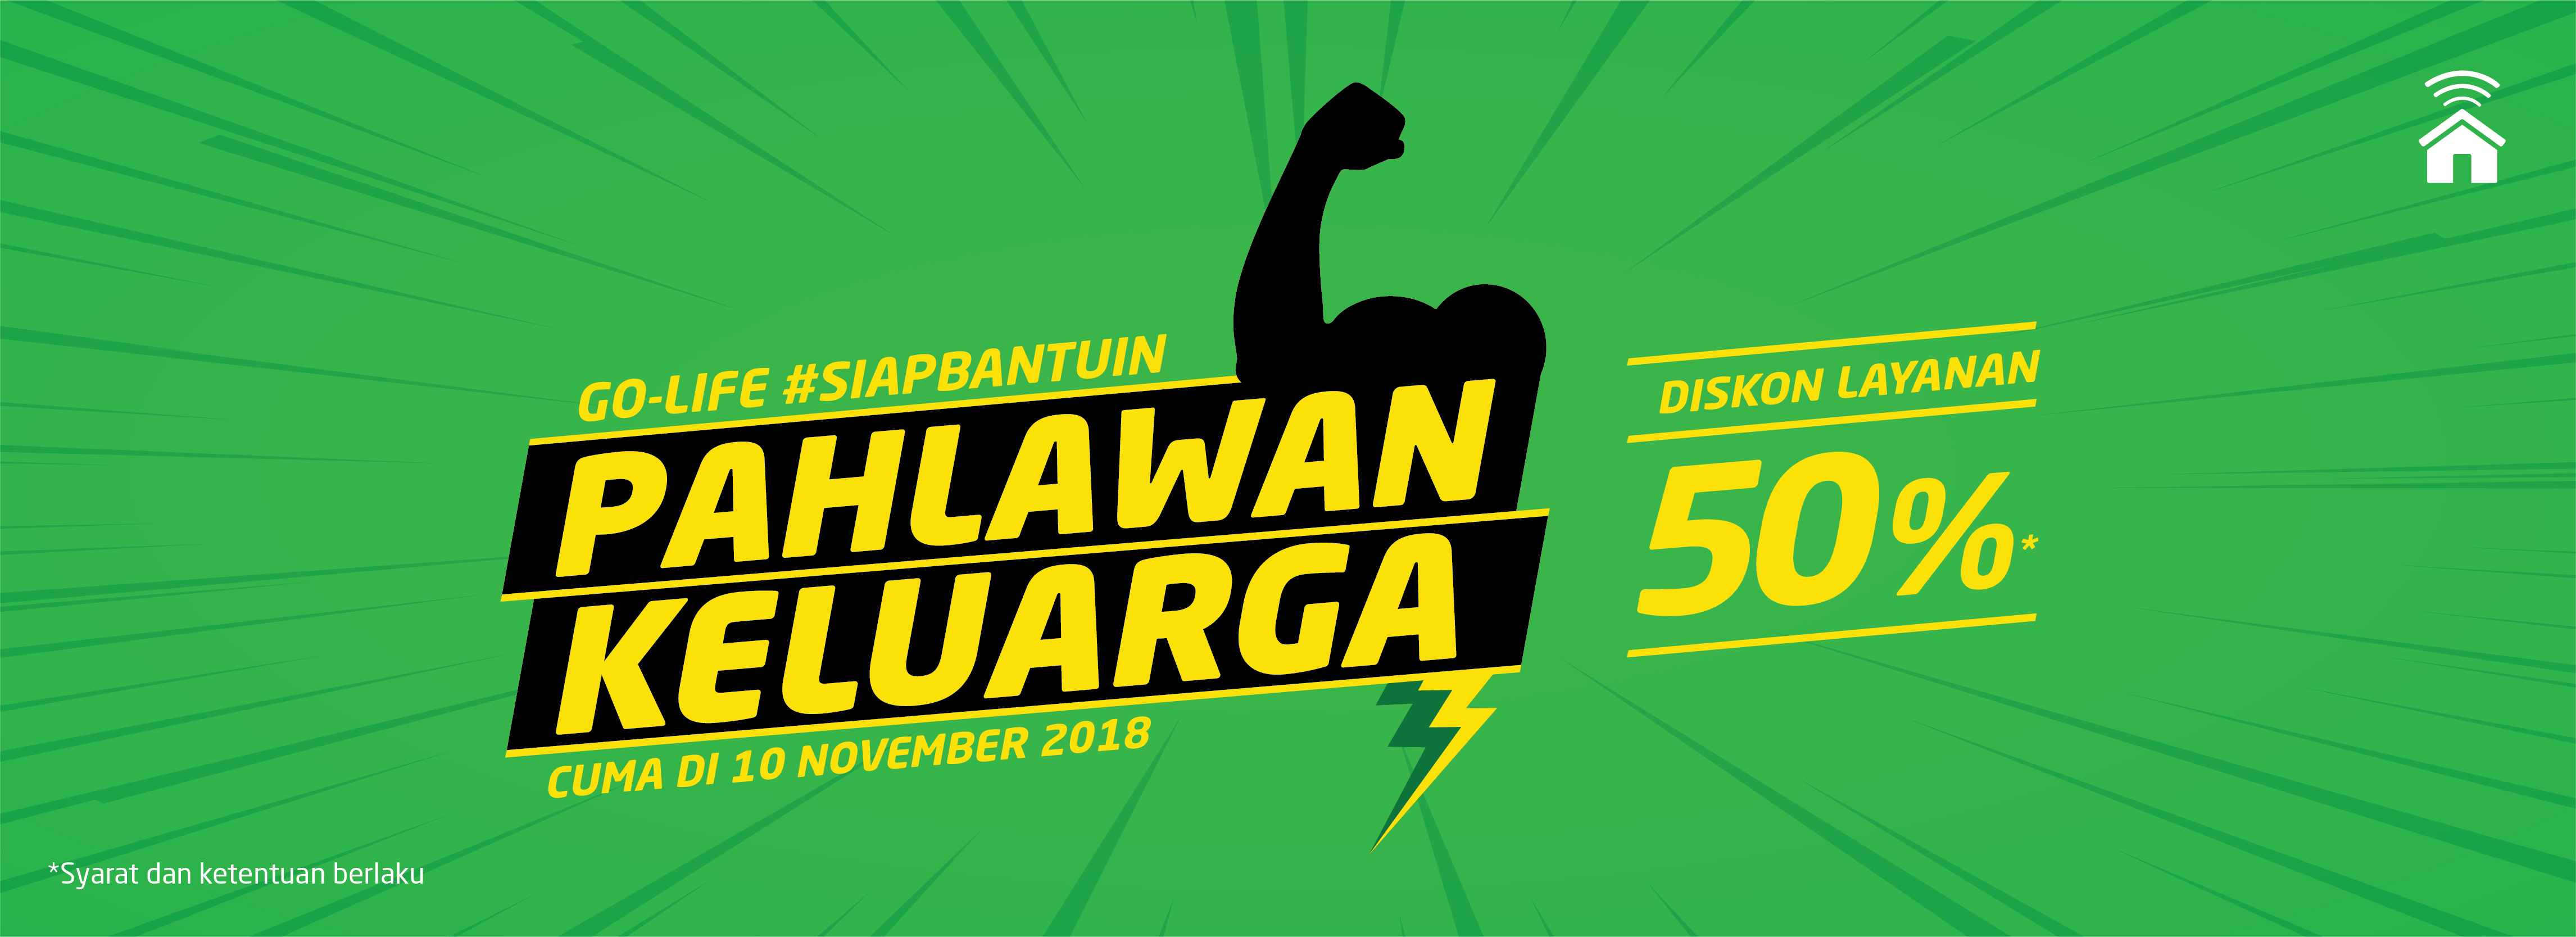 GO-LIFE #SiapBantuin Pahlawan Keluarga, Ada Diskon 50%!